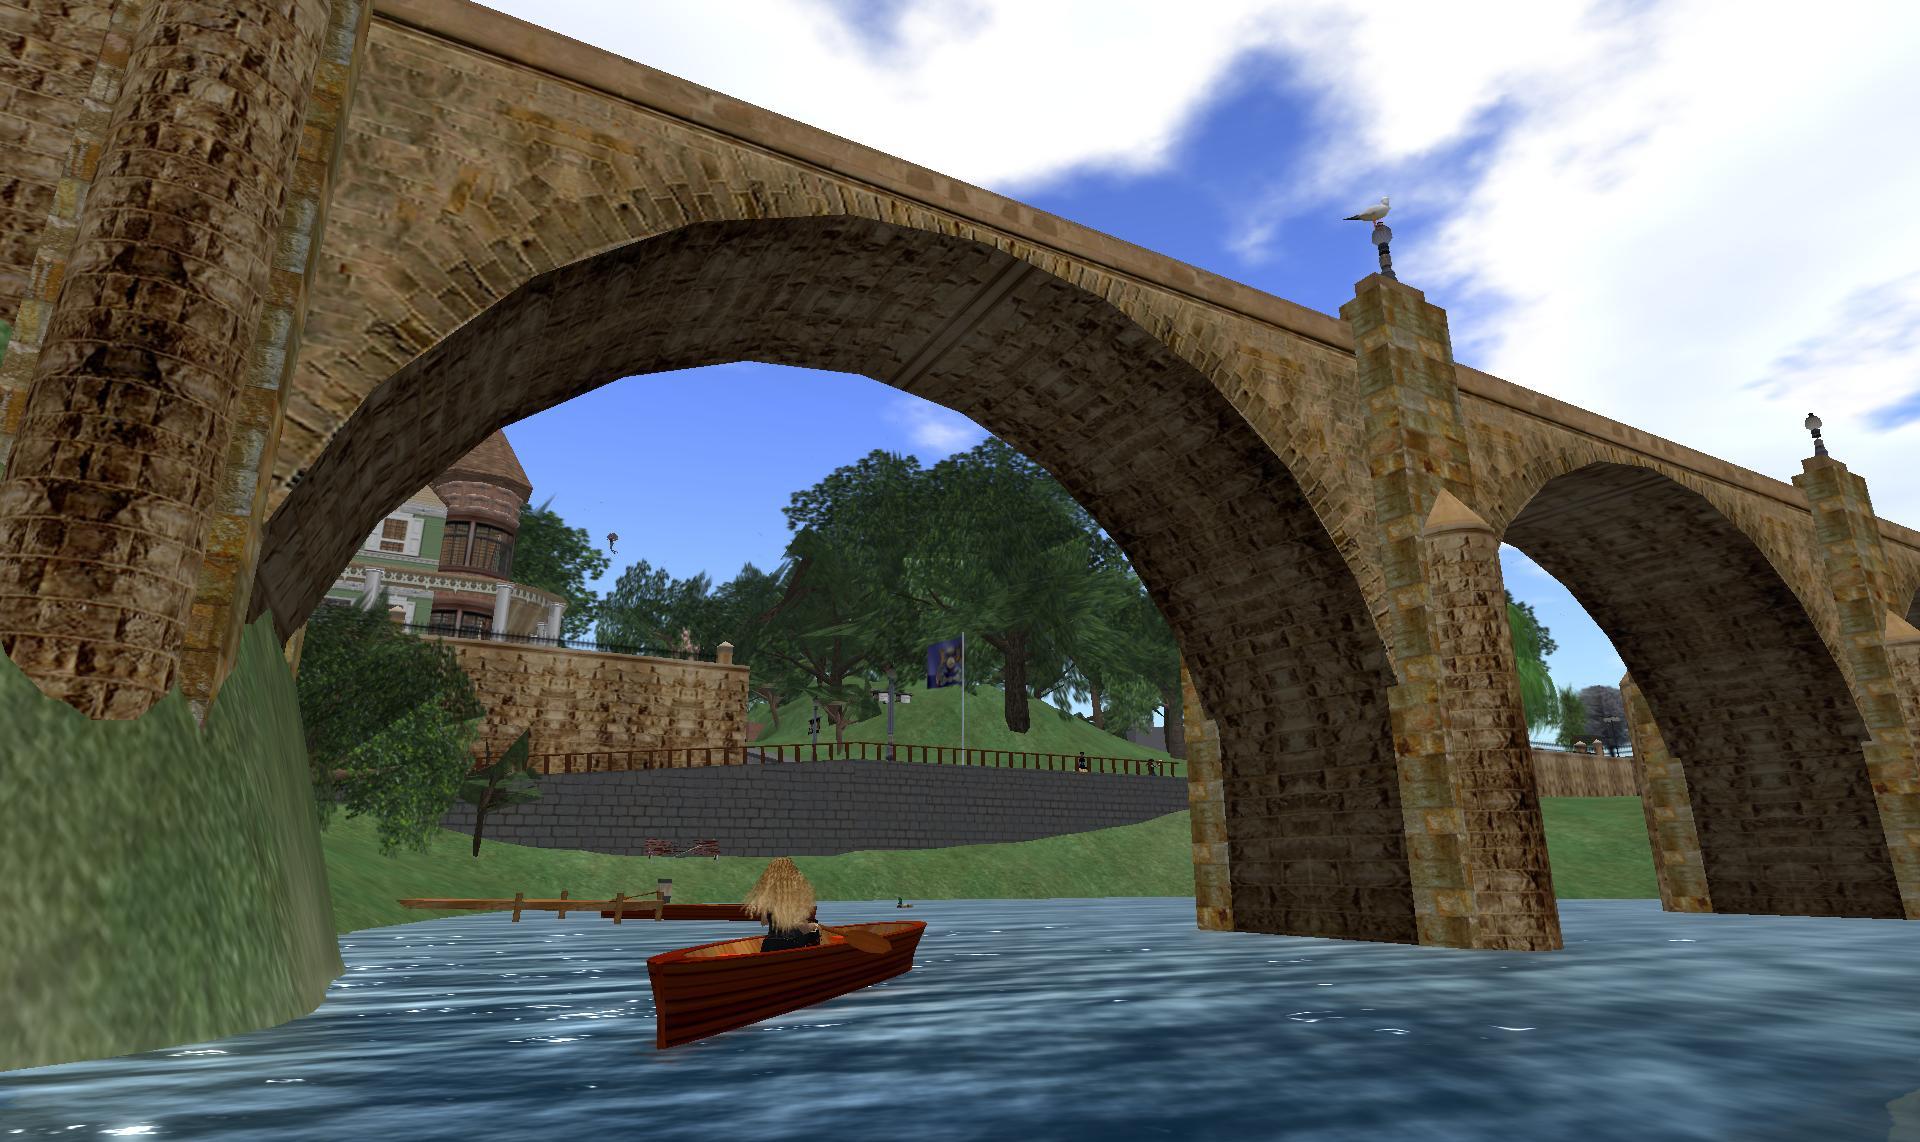 navigating-under-the-bridge